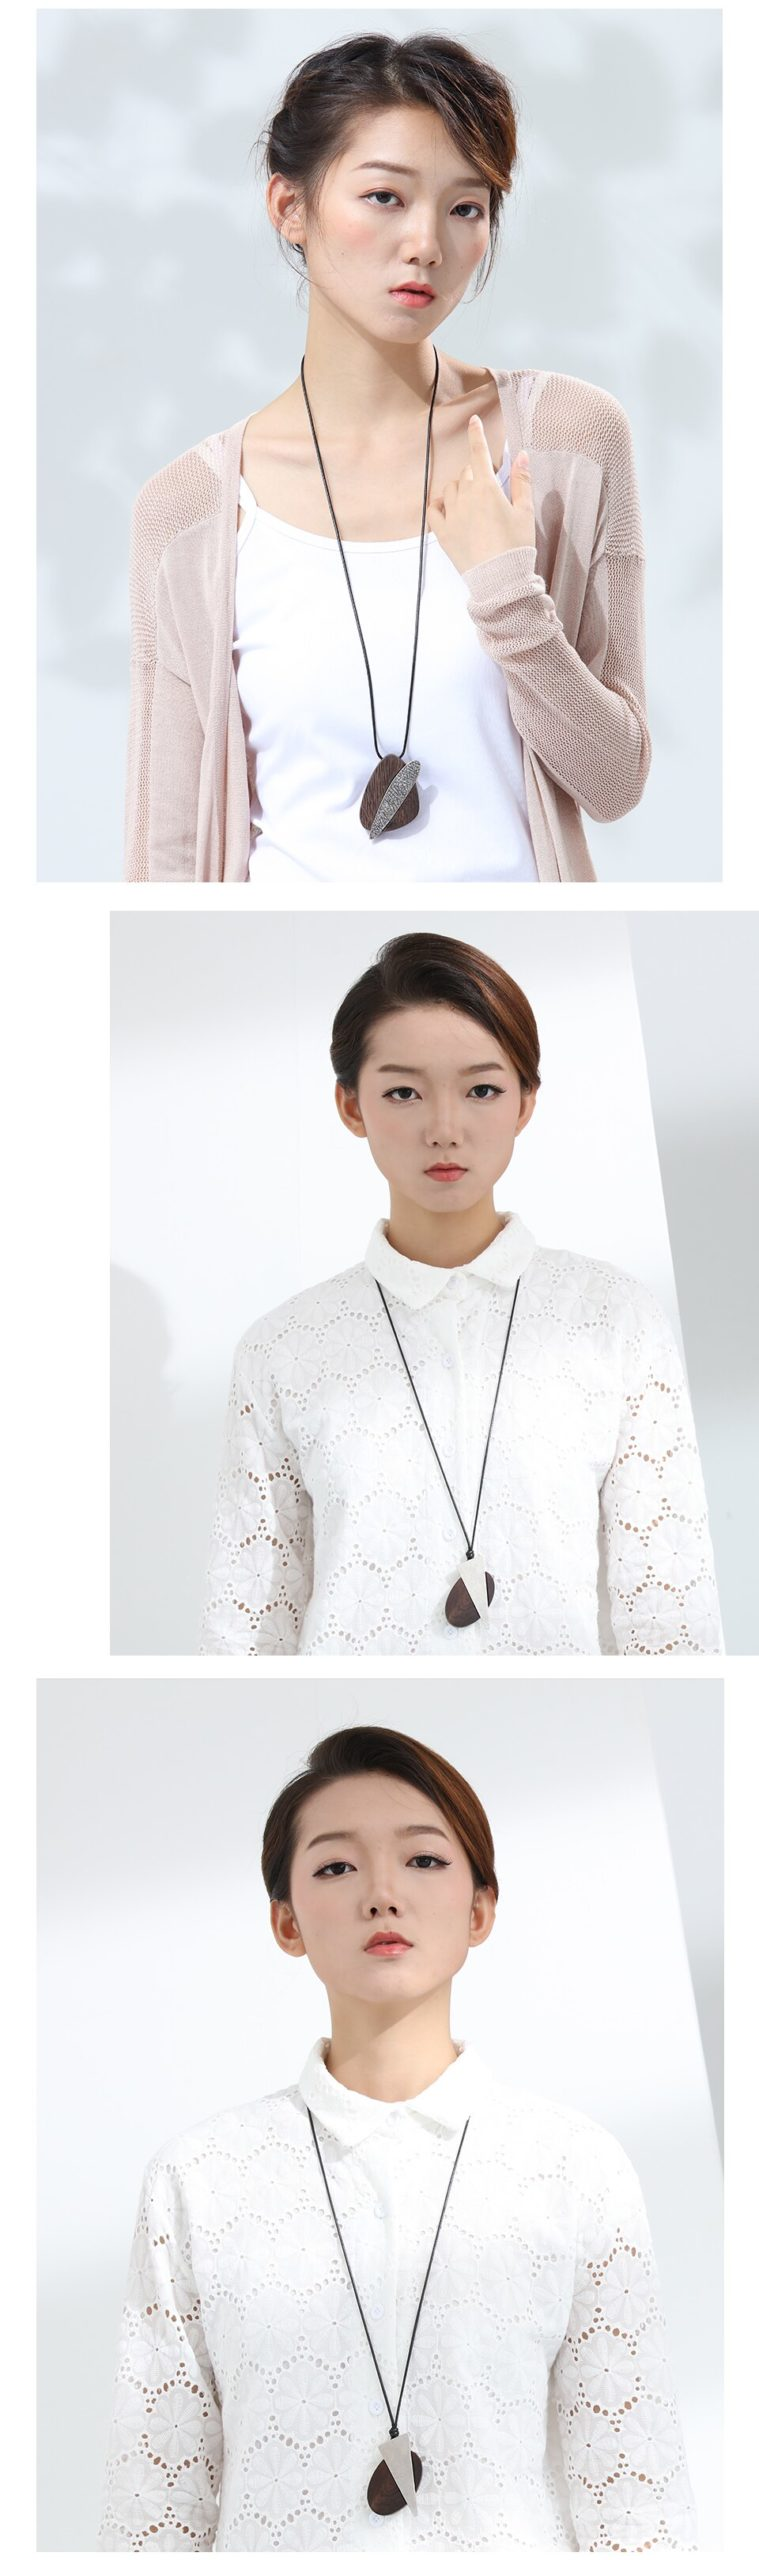 Handmade Unique Design Pendant Necklaces Vintage Sandalwood Women Sweater Chain Wooden Jewelry New Fashion Big Pendant Wholesale